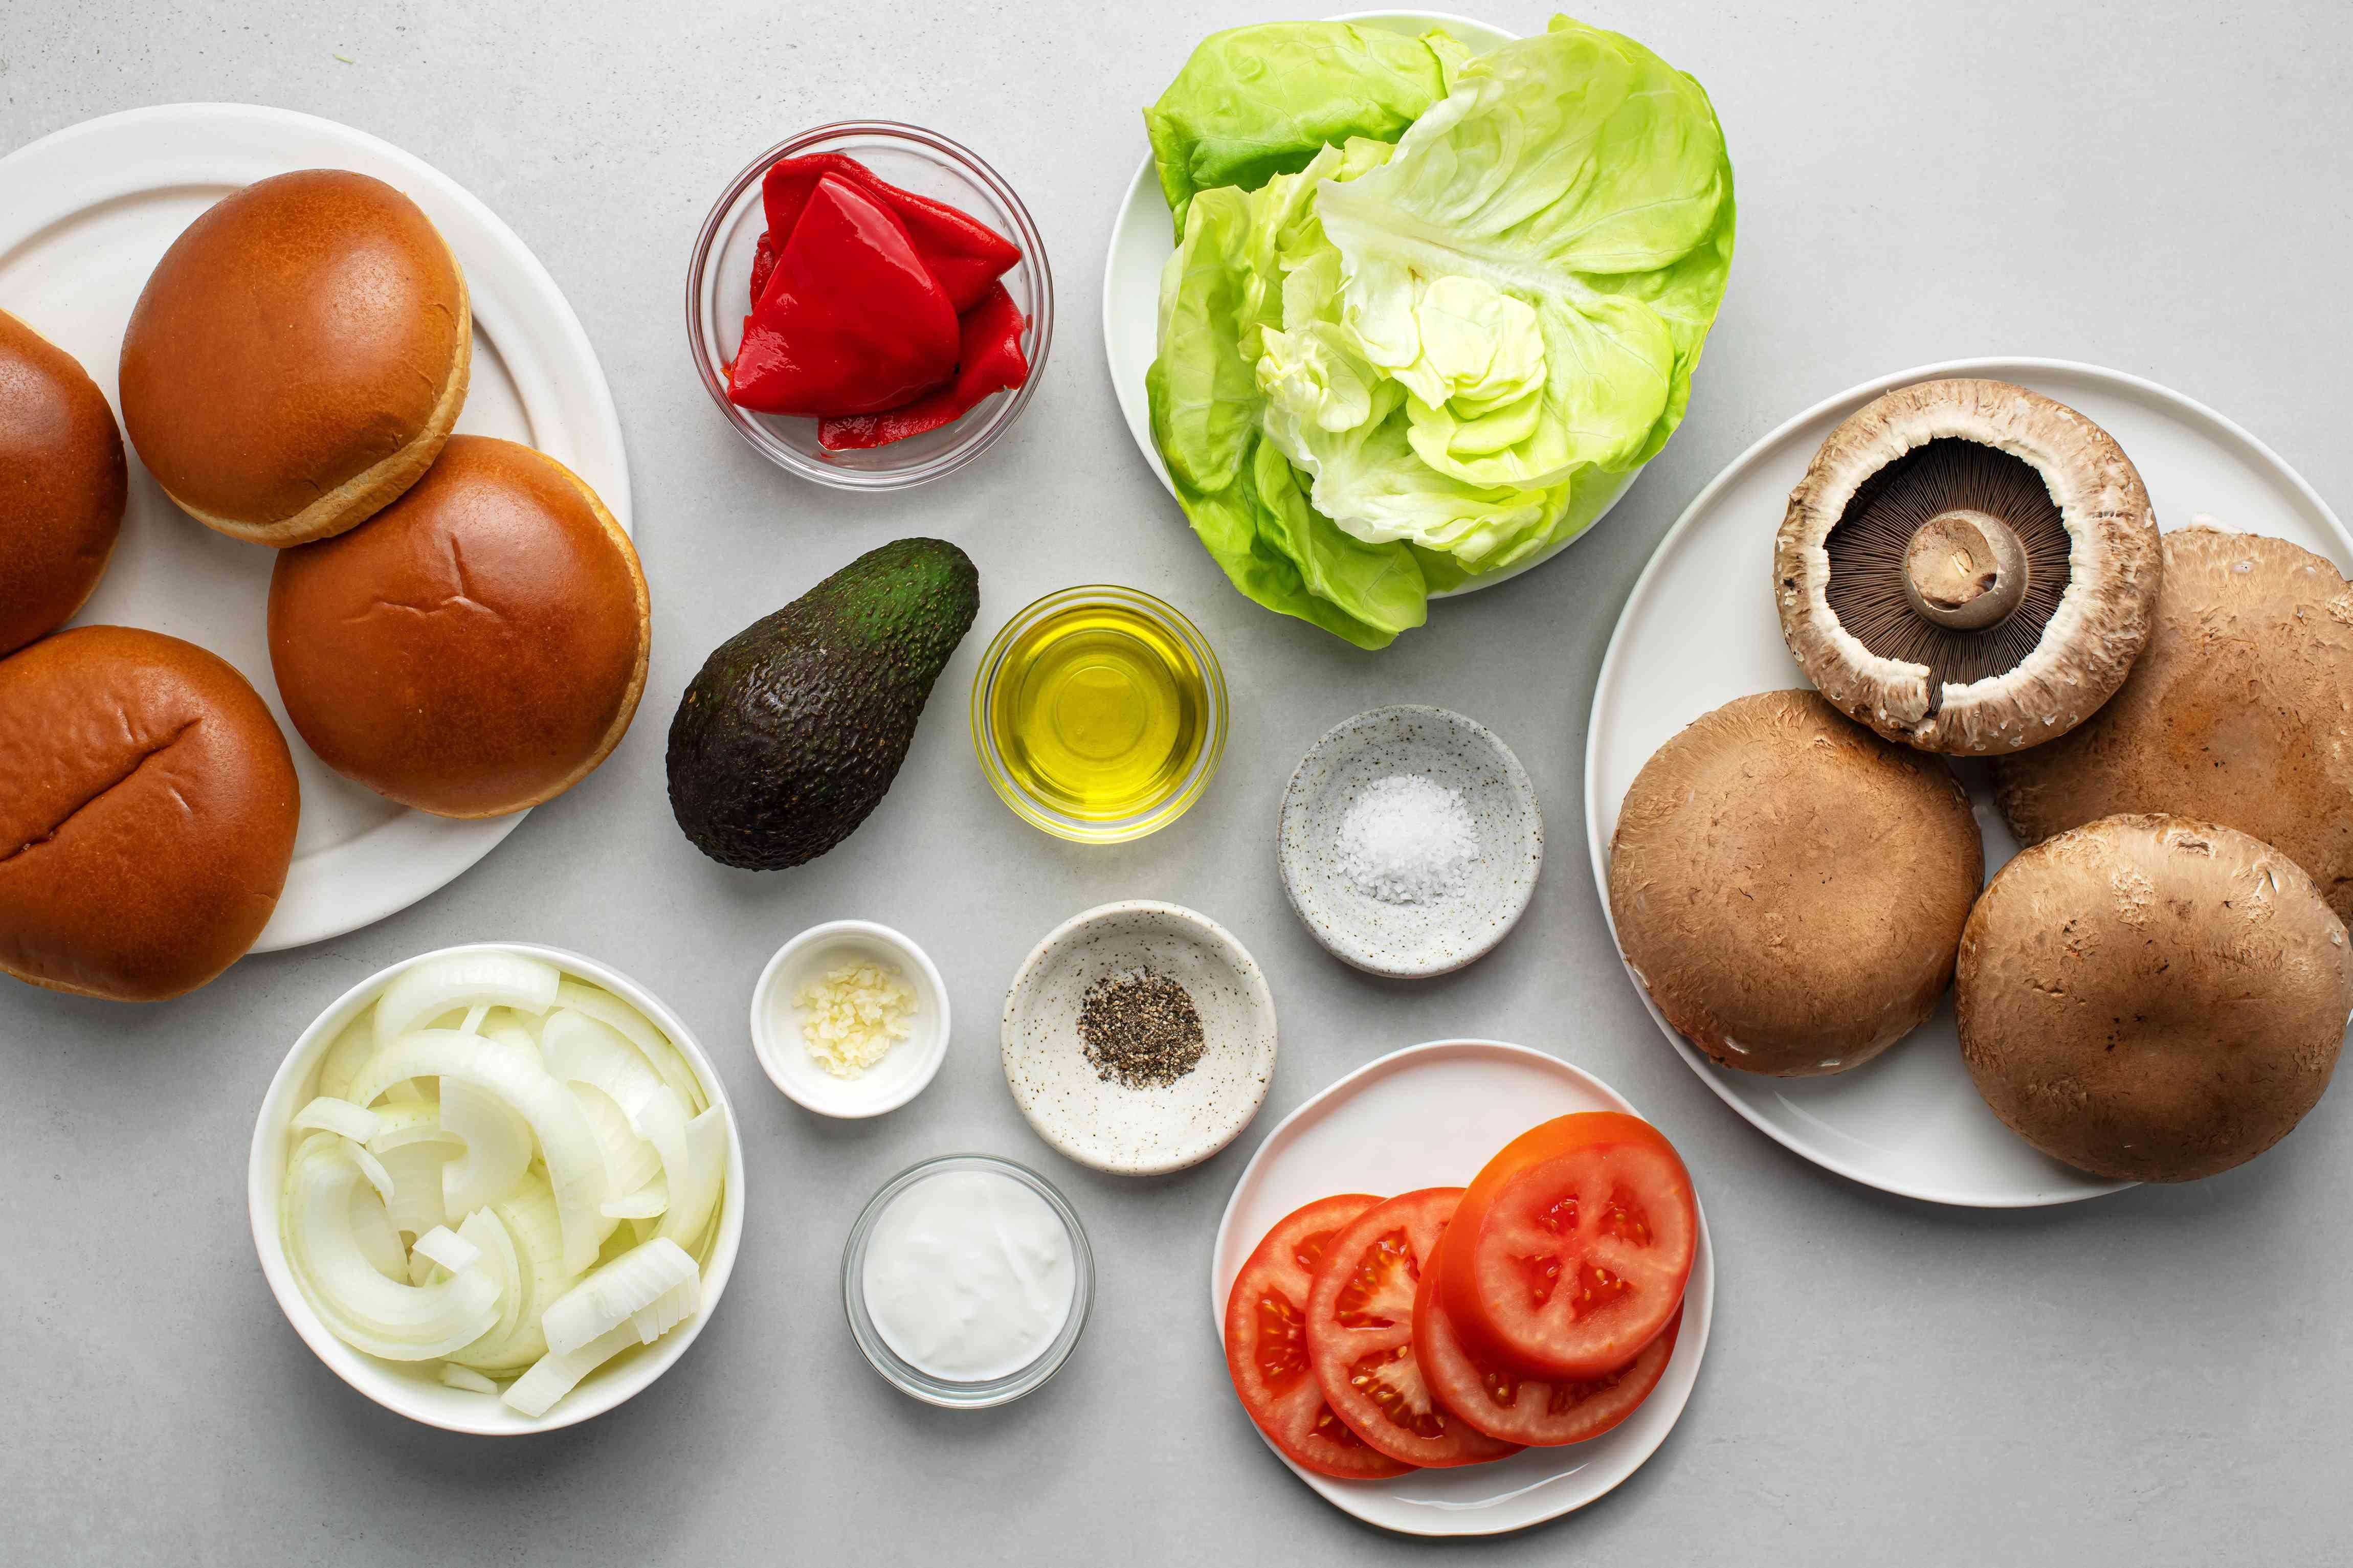 Vegetarian Portobello Mushroom and Avocado Burger ingredients